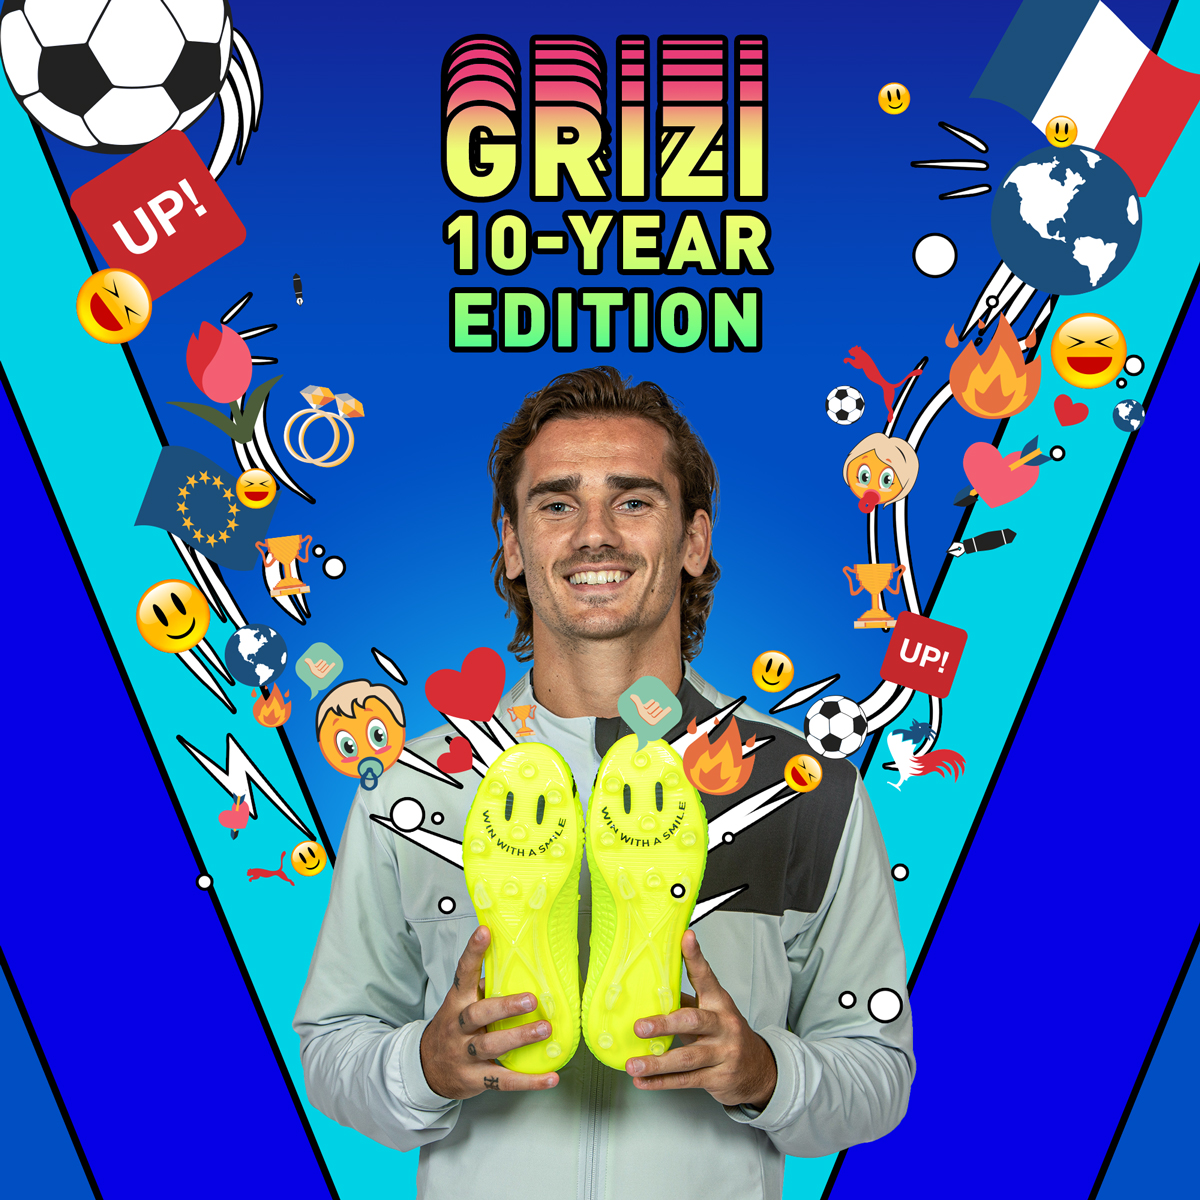 19AW_Social_IG_TS_Football_Griezmann-Special-Edition_FUTURE_Q4_2000x2000_001.jpg